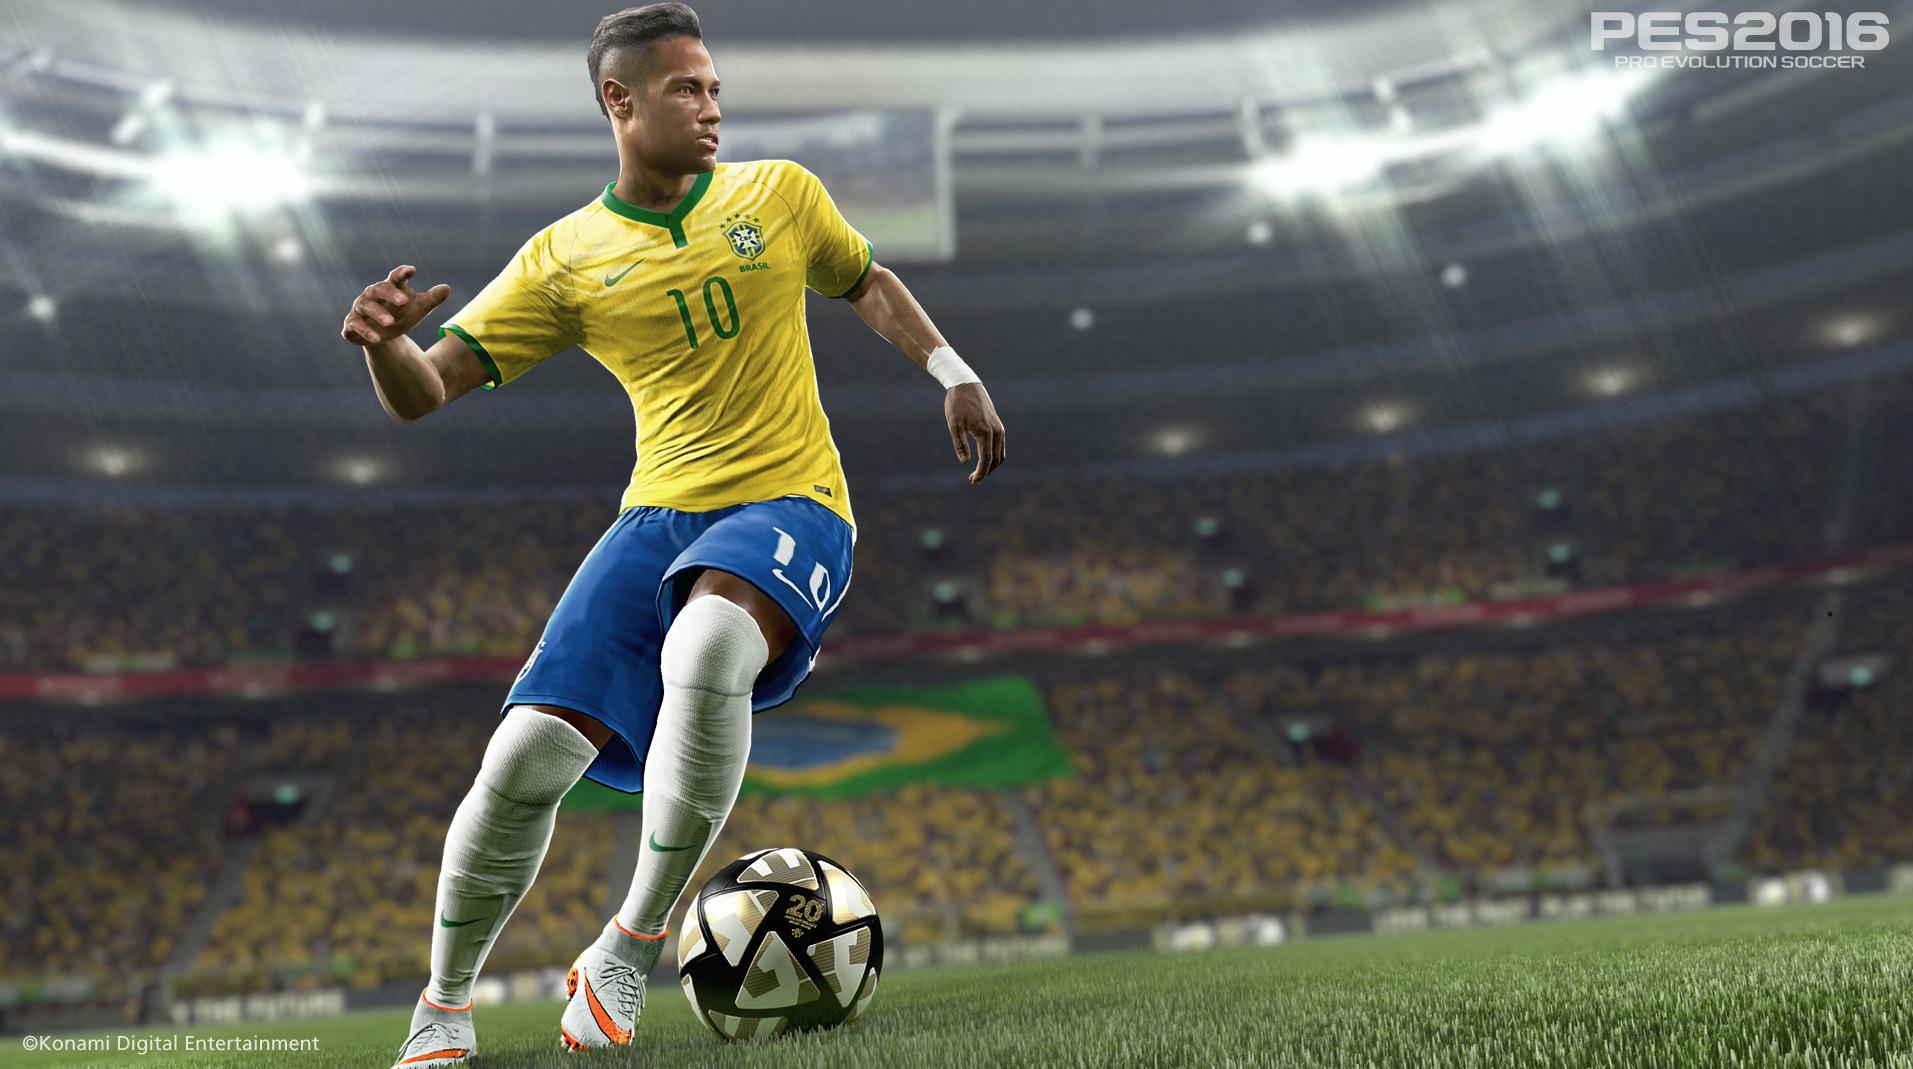 FIFA 2016 vs PES 2016: Neymar